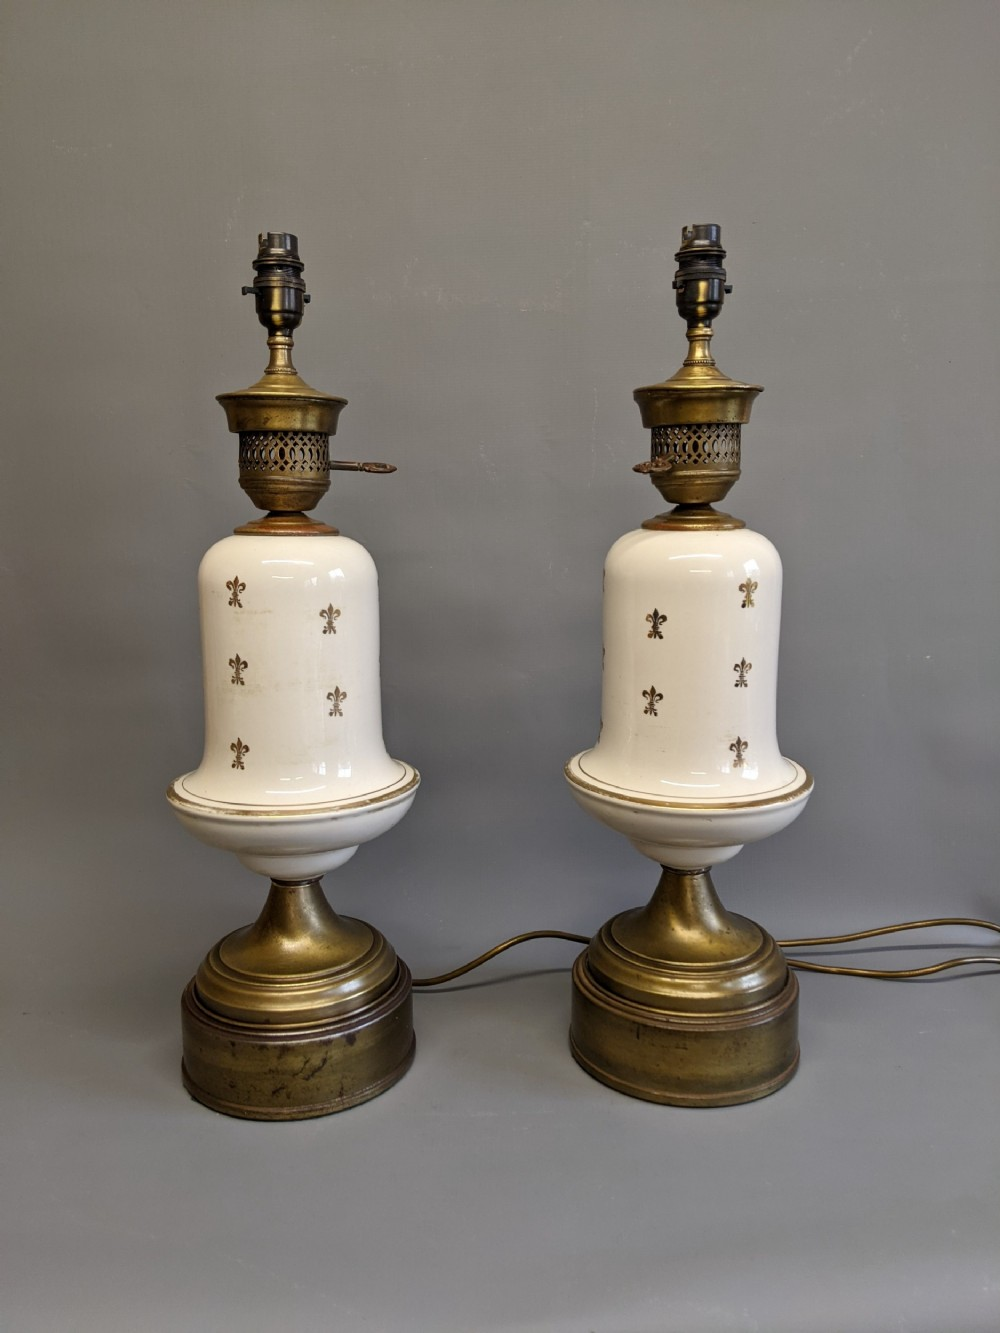 19th century white porcelain brass lamps